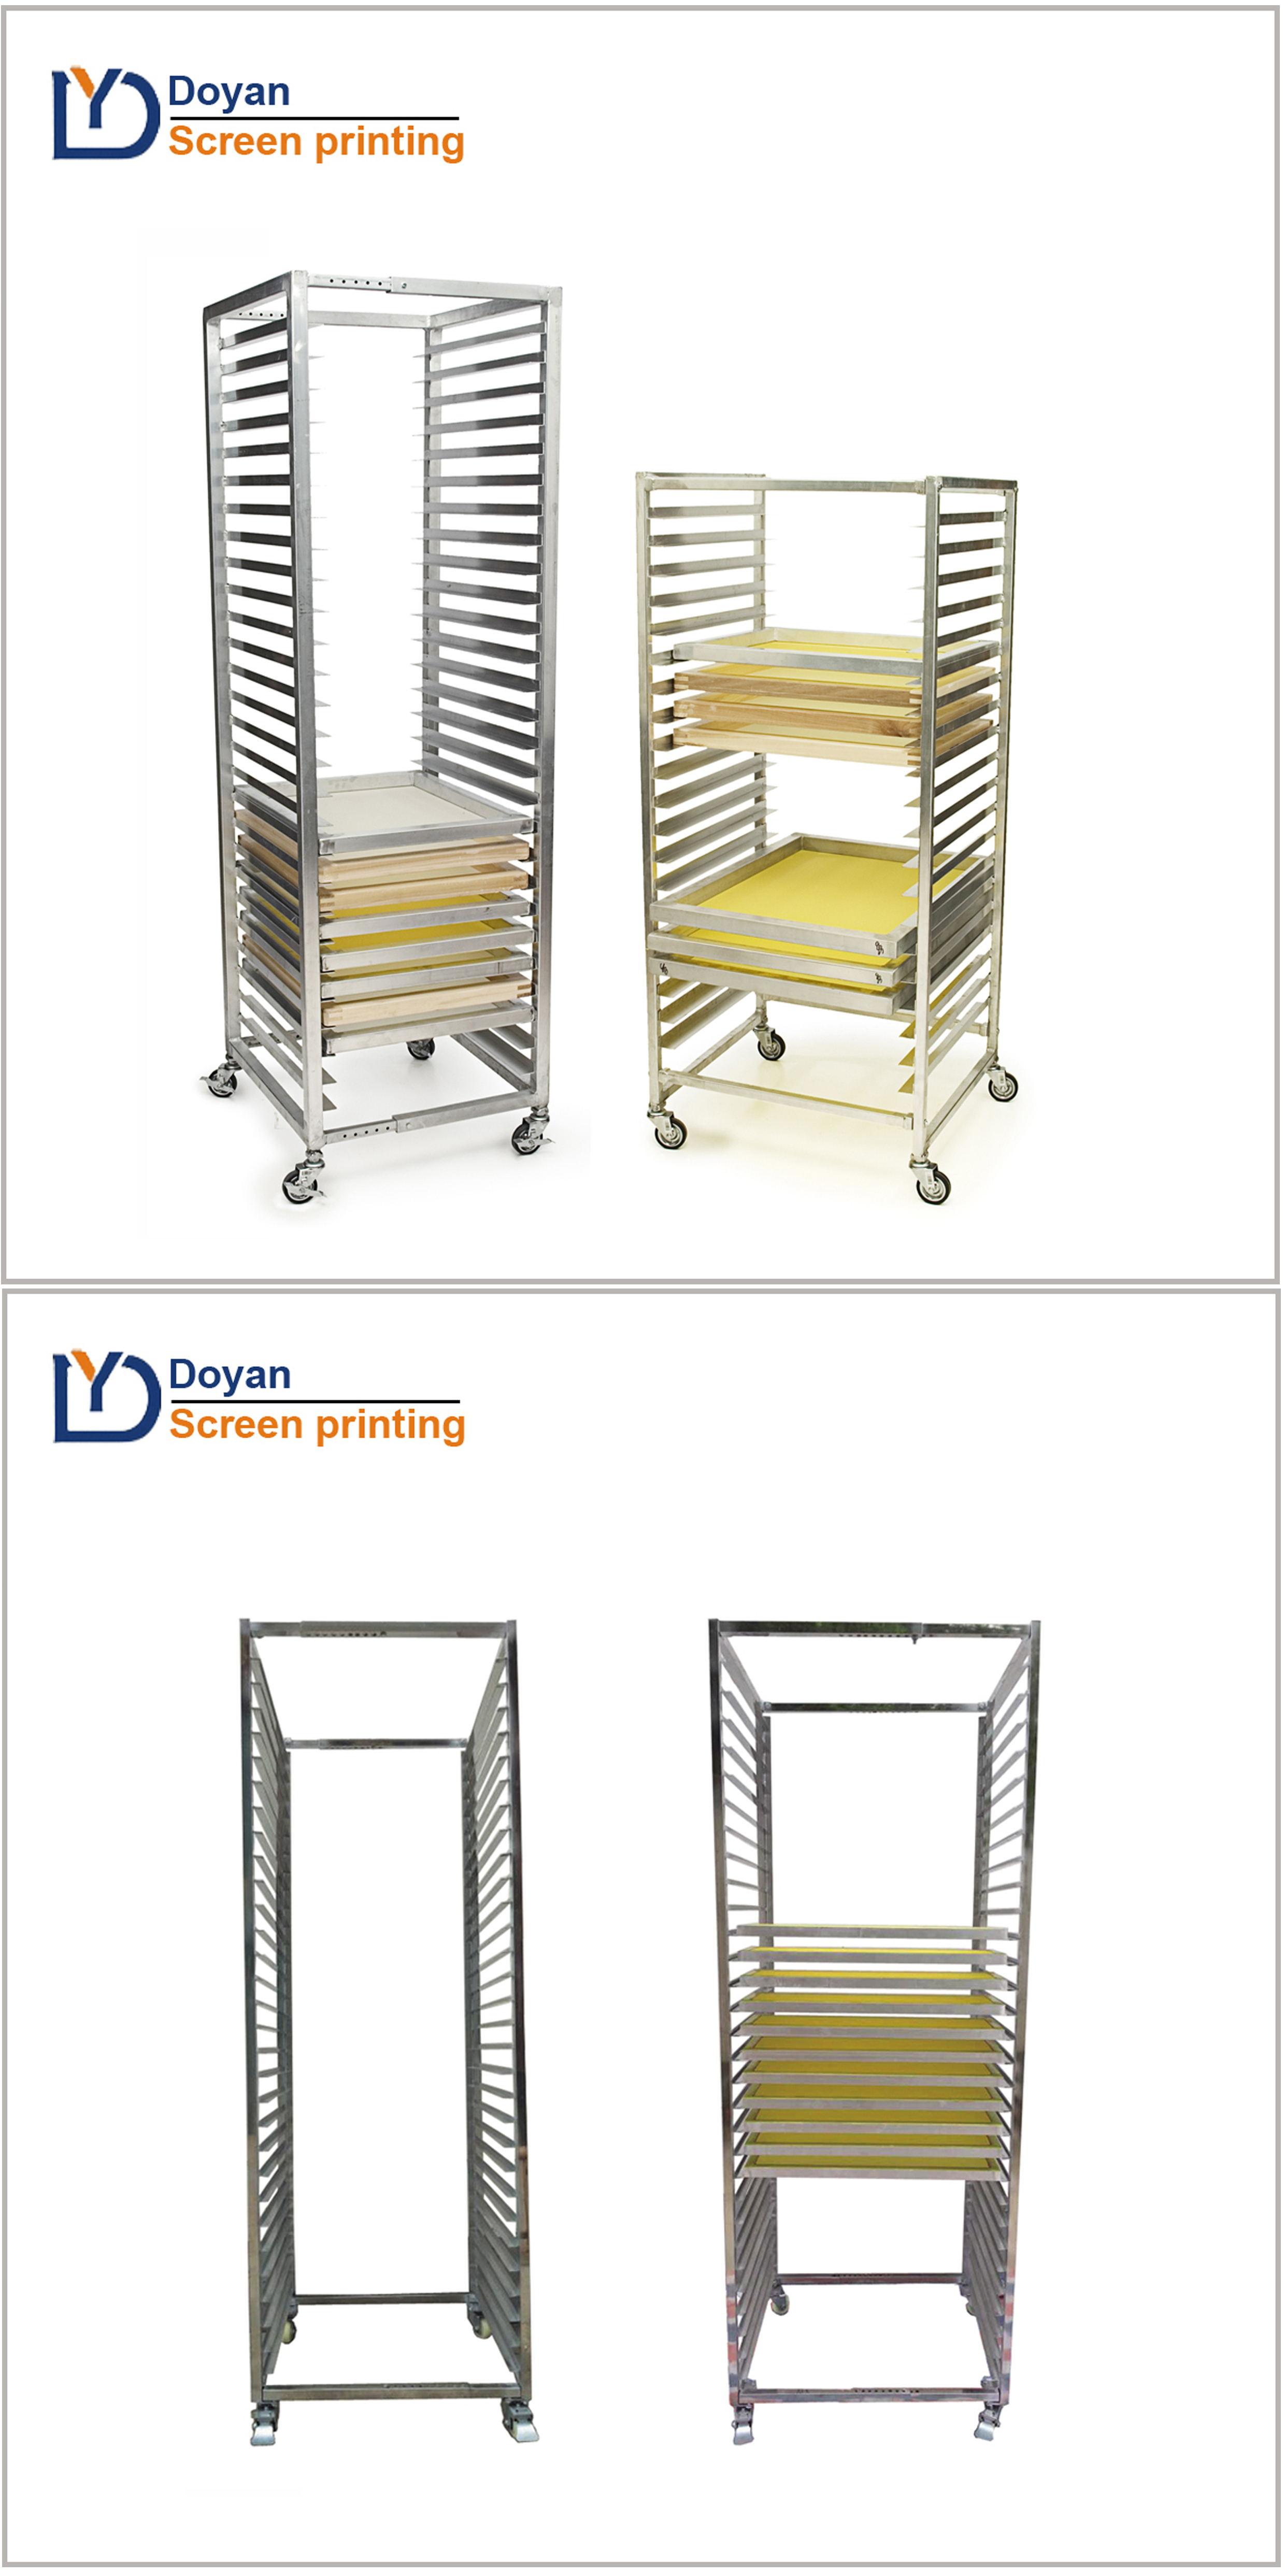 Screen printing frame dry racks